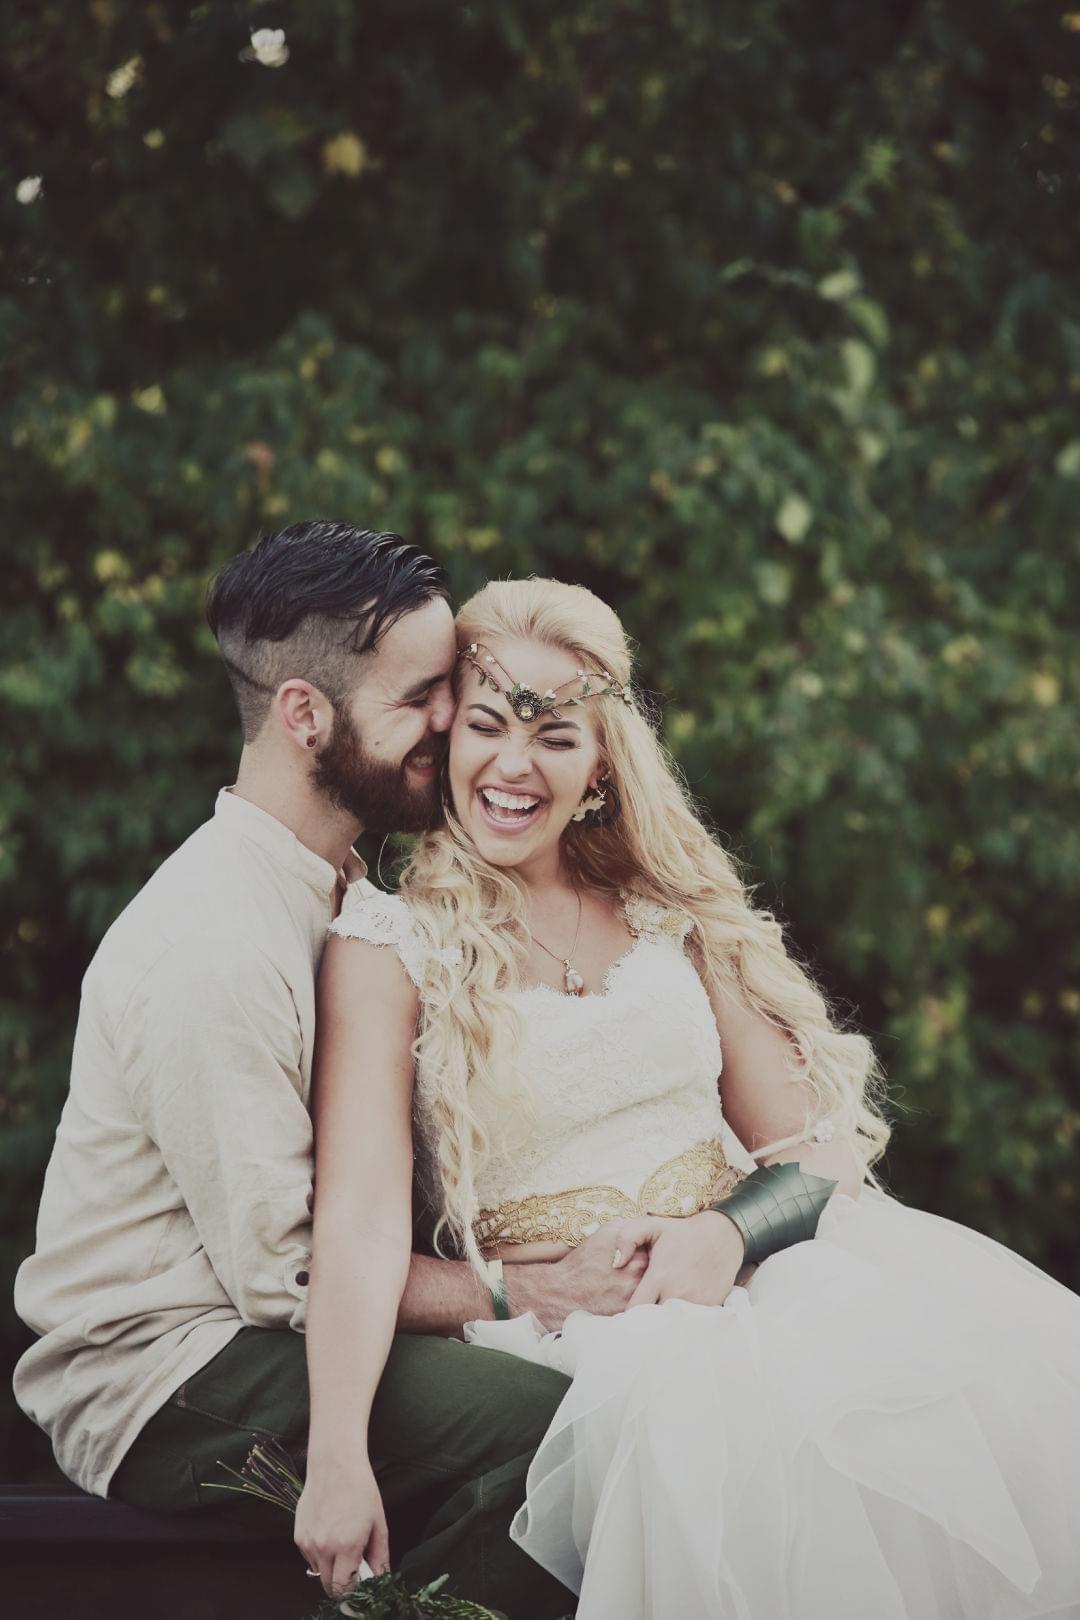 How To Choose A Wedding Theme Wedding Photo Poses Pinterest